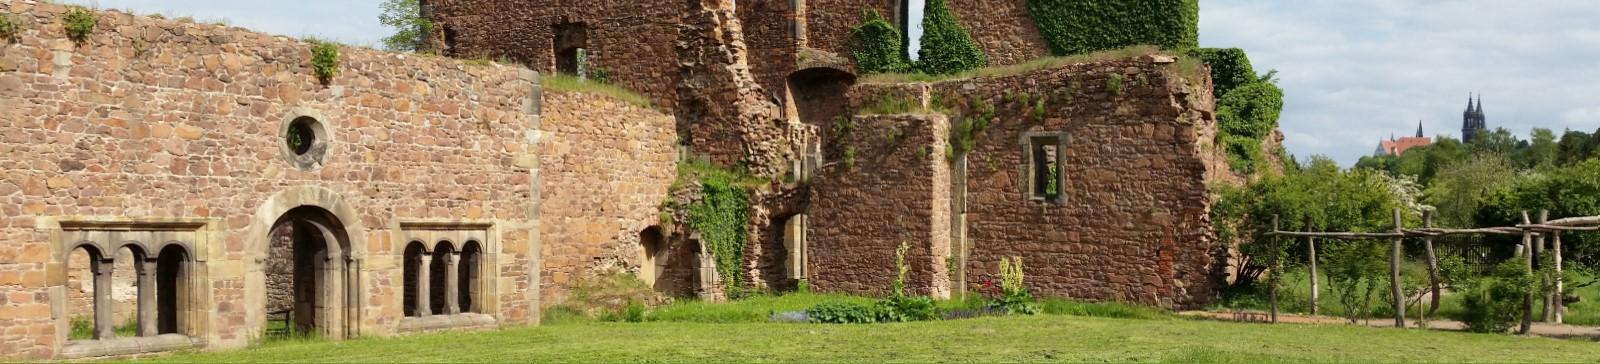 Sliderbild Kloster